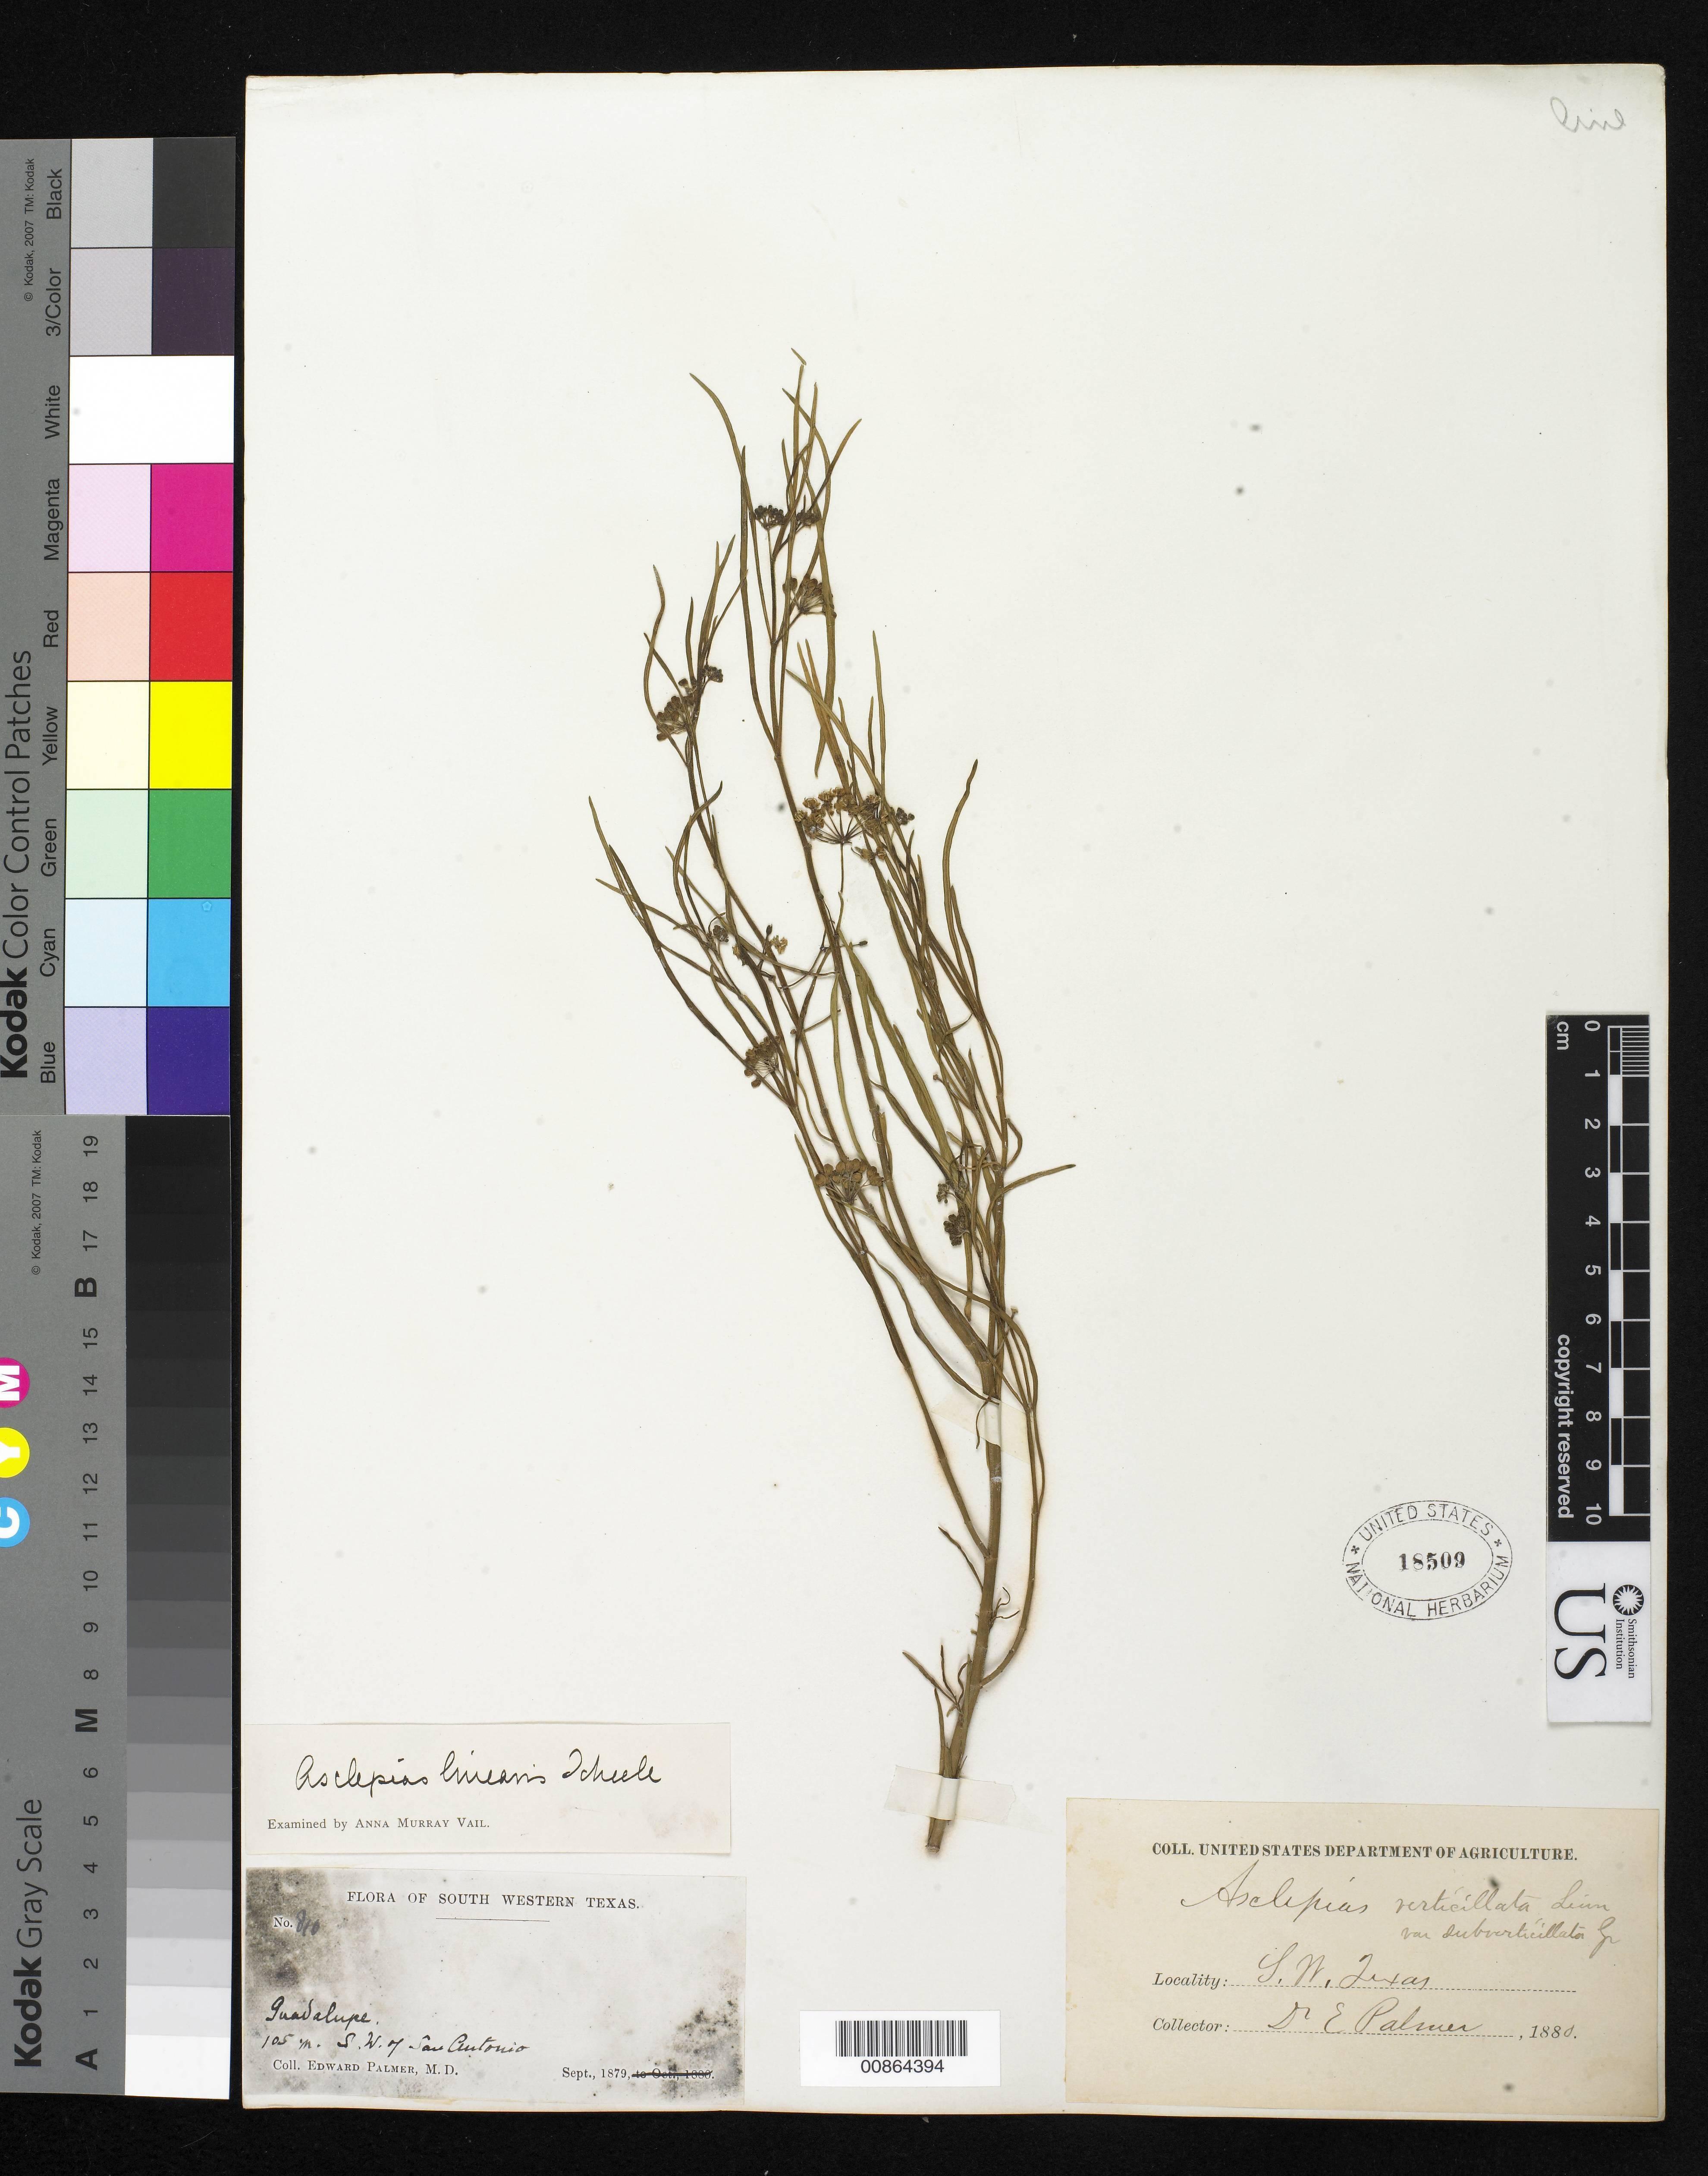 Image of slim milkweed